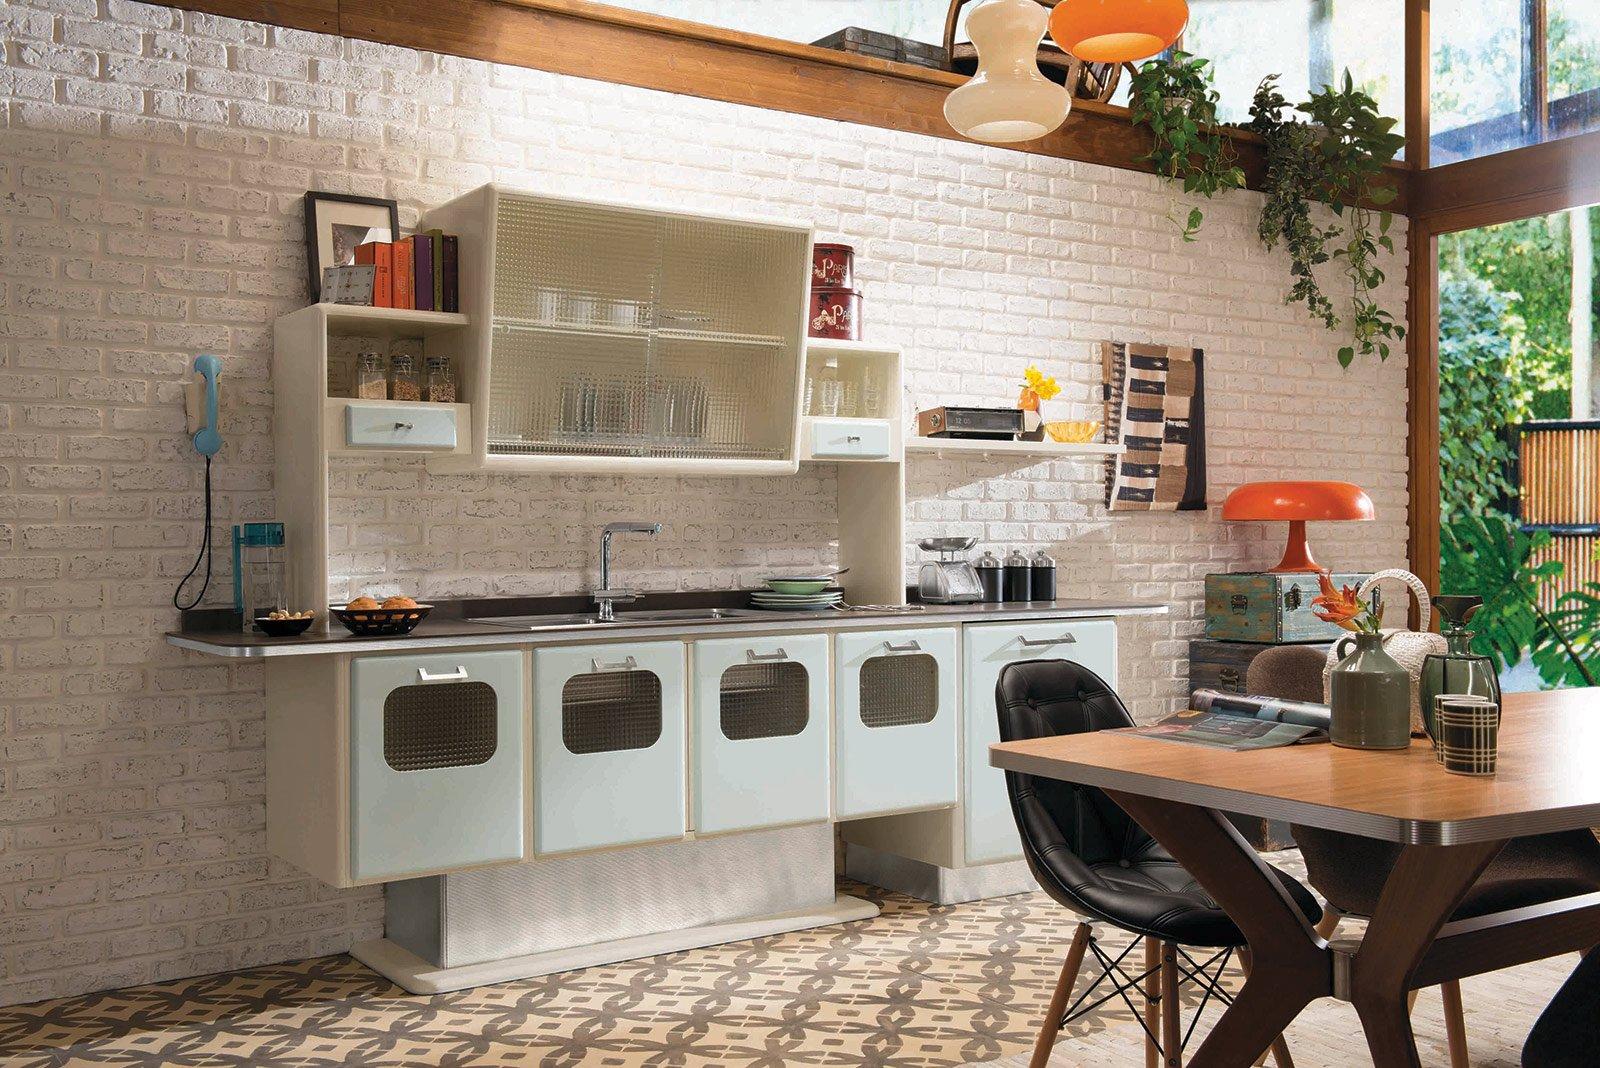 Di Eurocucina 2014. Con Design Rétro O Supermoderno Cose Di Casa #9D5D2E 1600 1068 Immagini Di Cucine Toscane